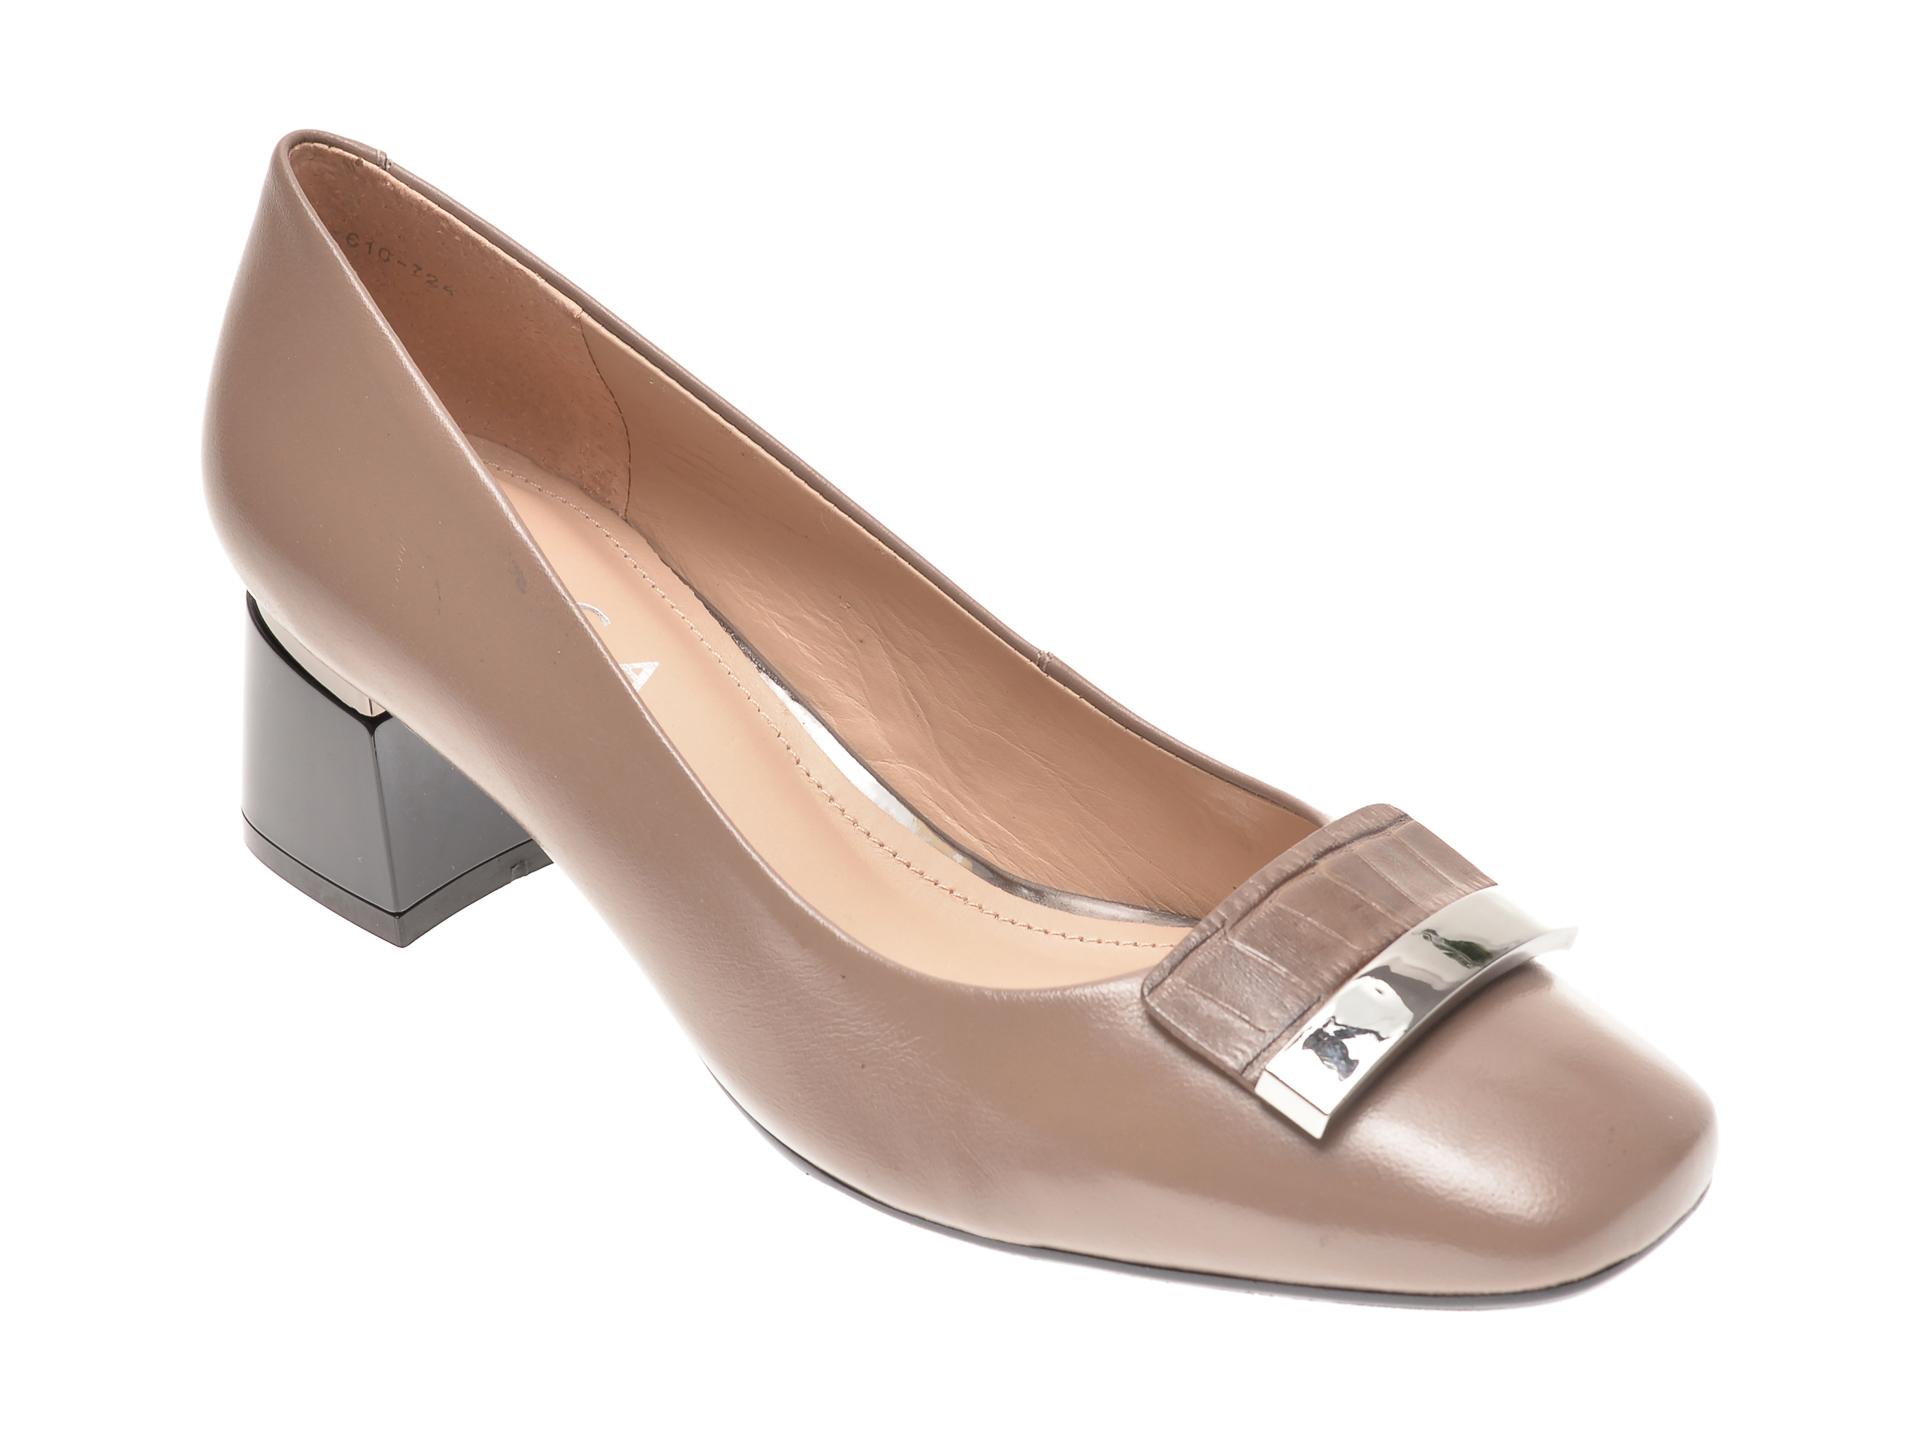 Pantofi EPICA gri, 2061610, din piele naturala